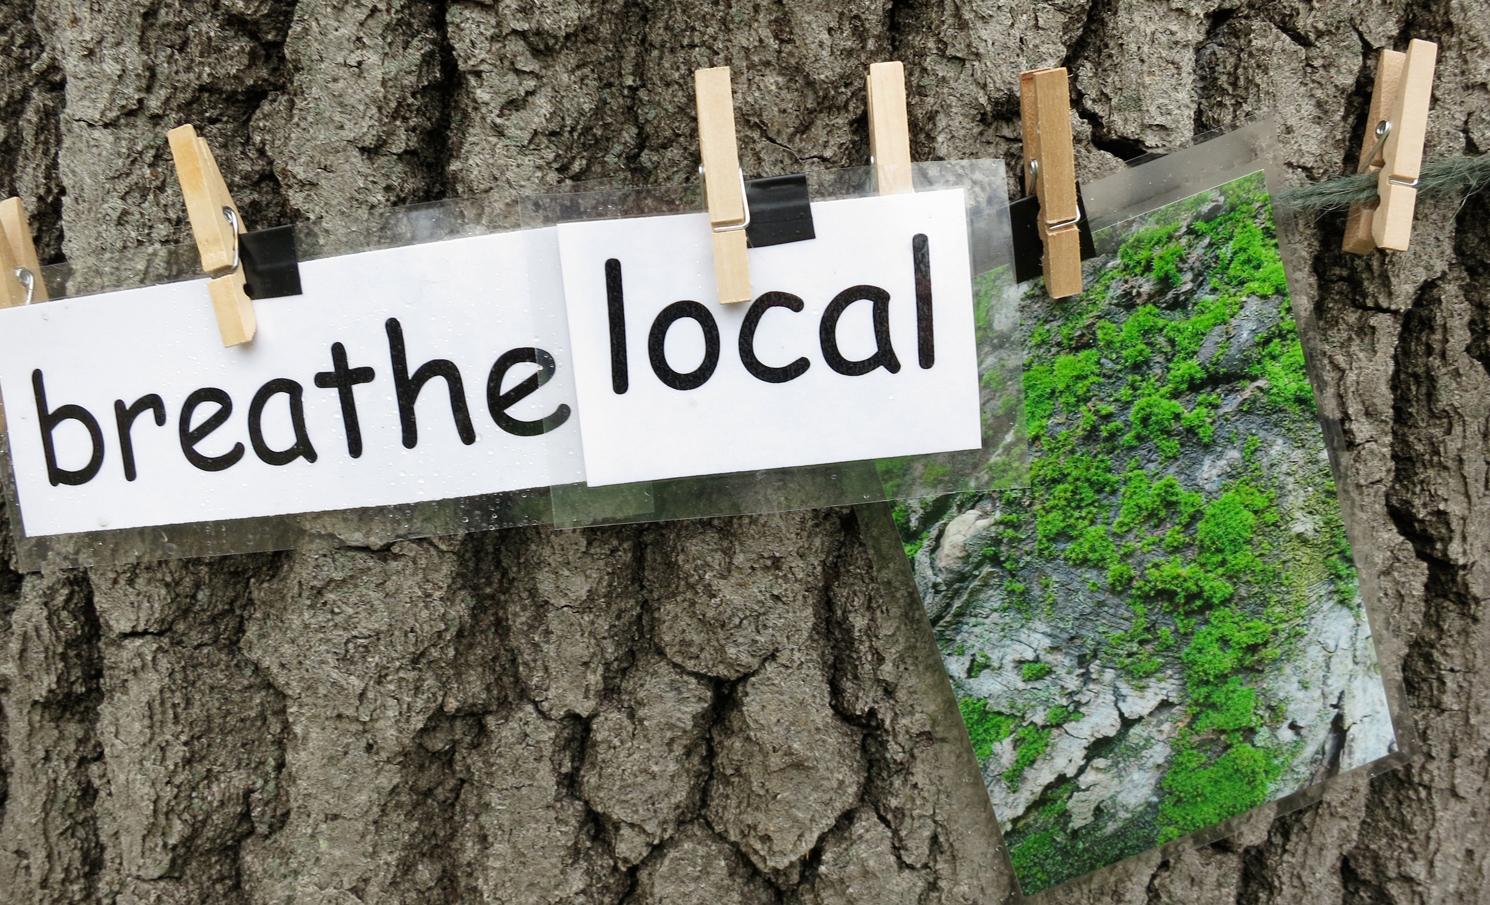 Breathe+local+moss.jpg